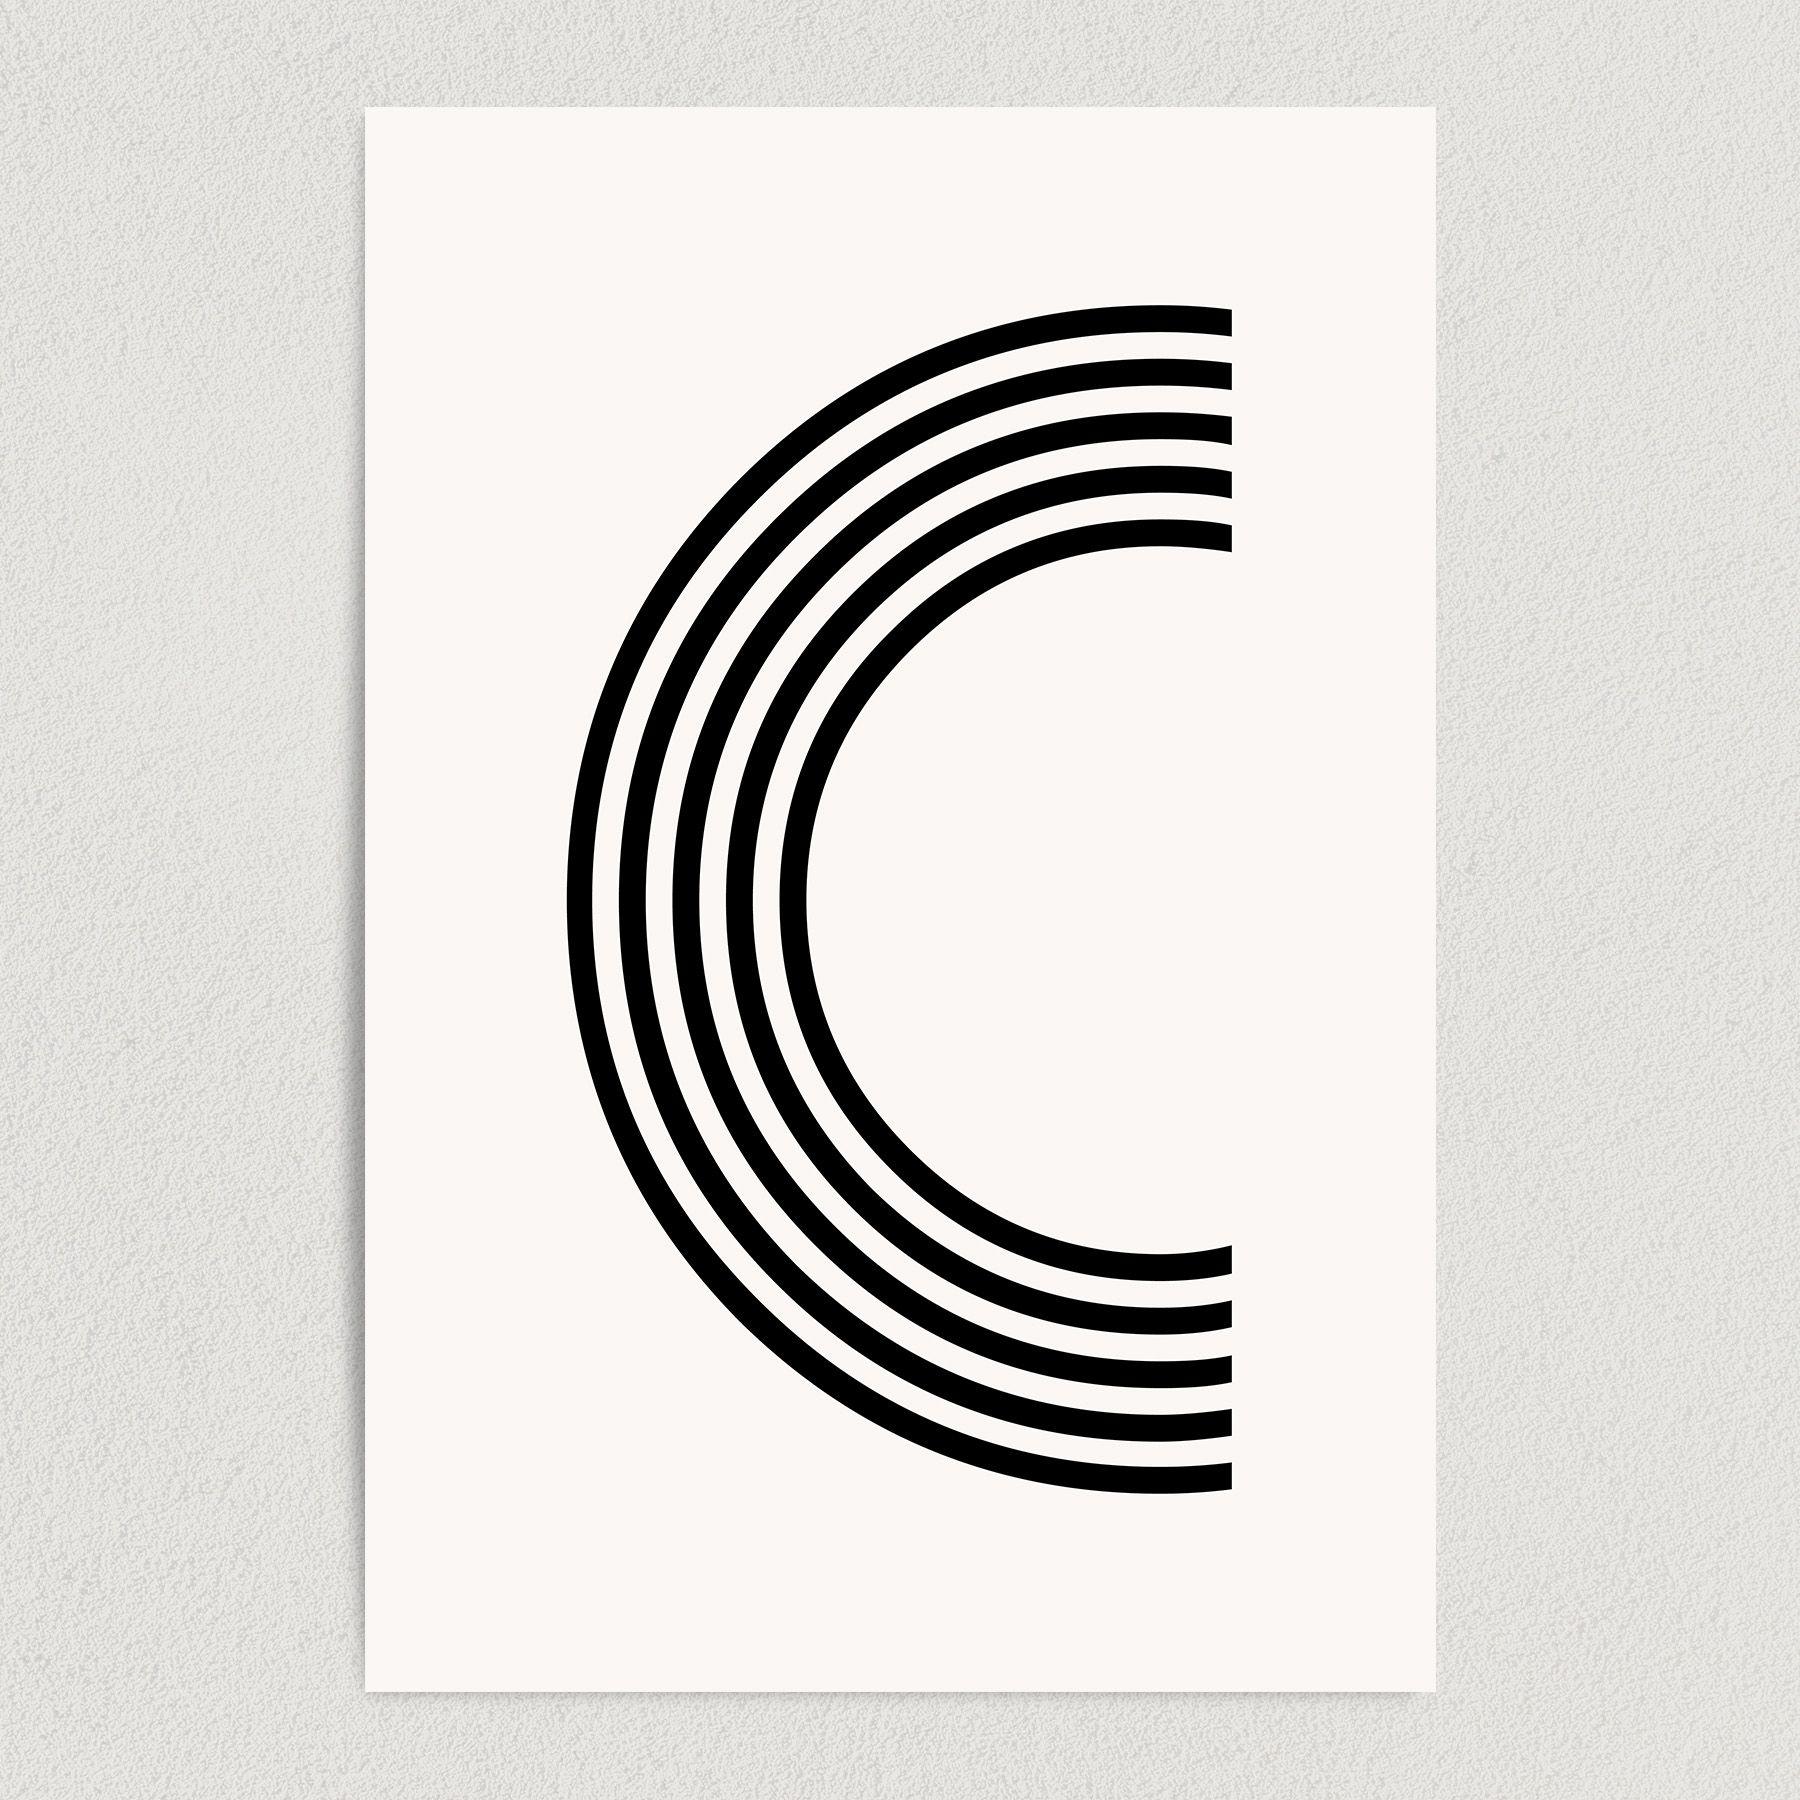 Letter C Modern Typography Art Print Poster 12″ x 18″ Wall Art M2162